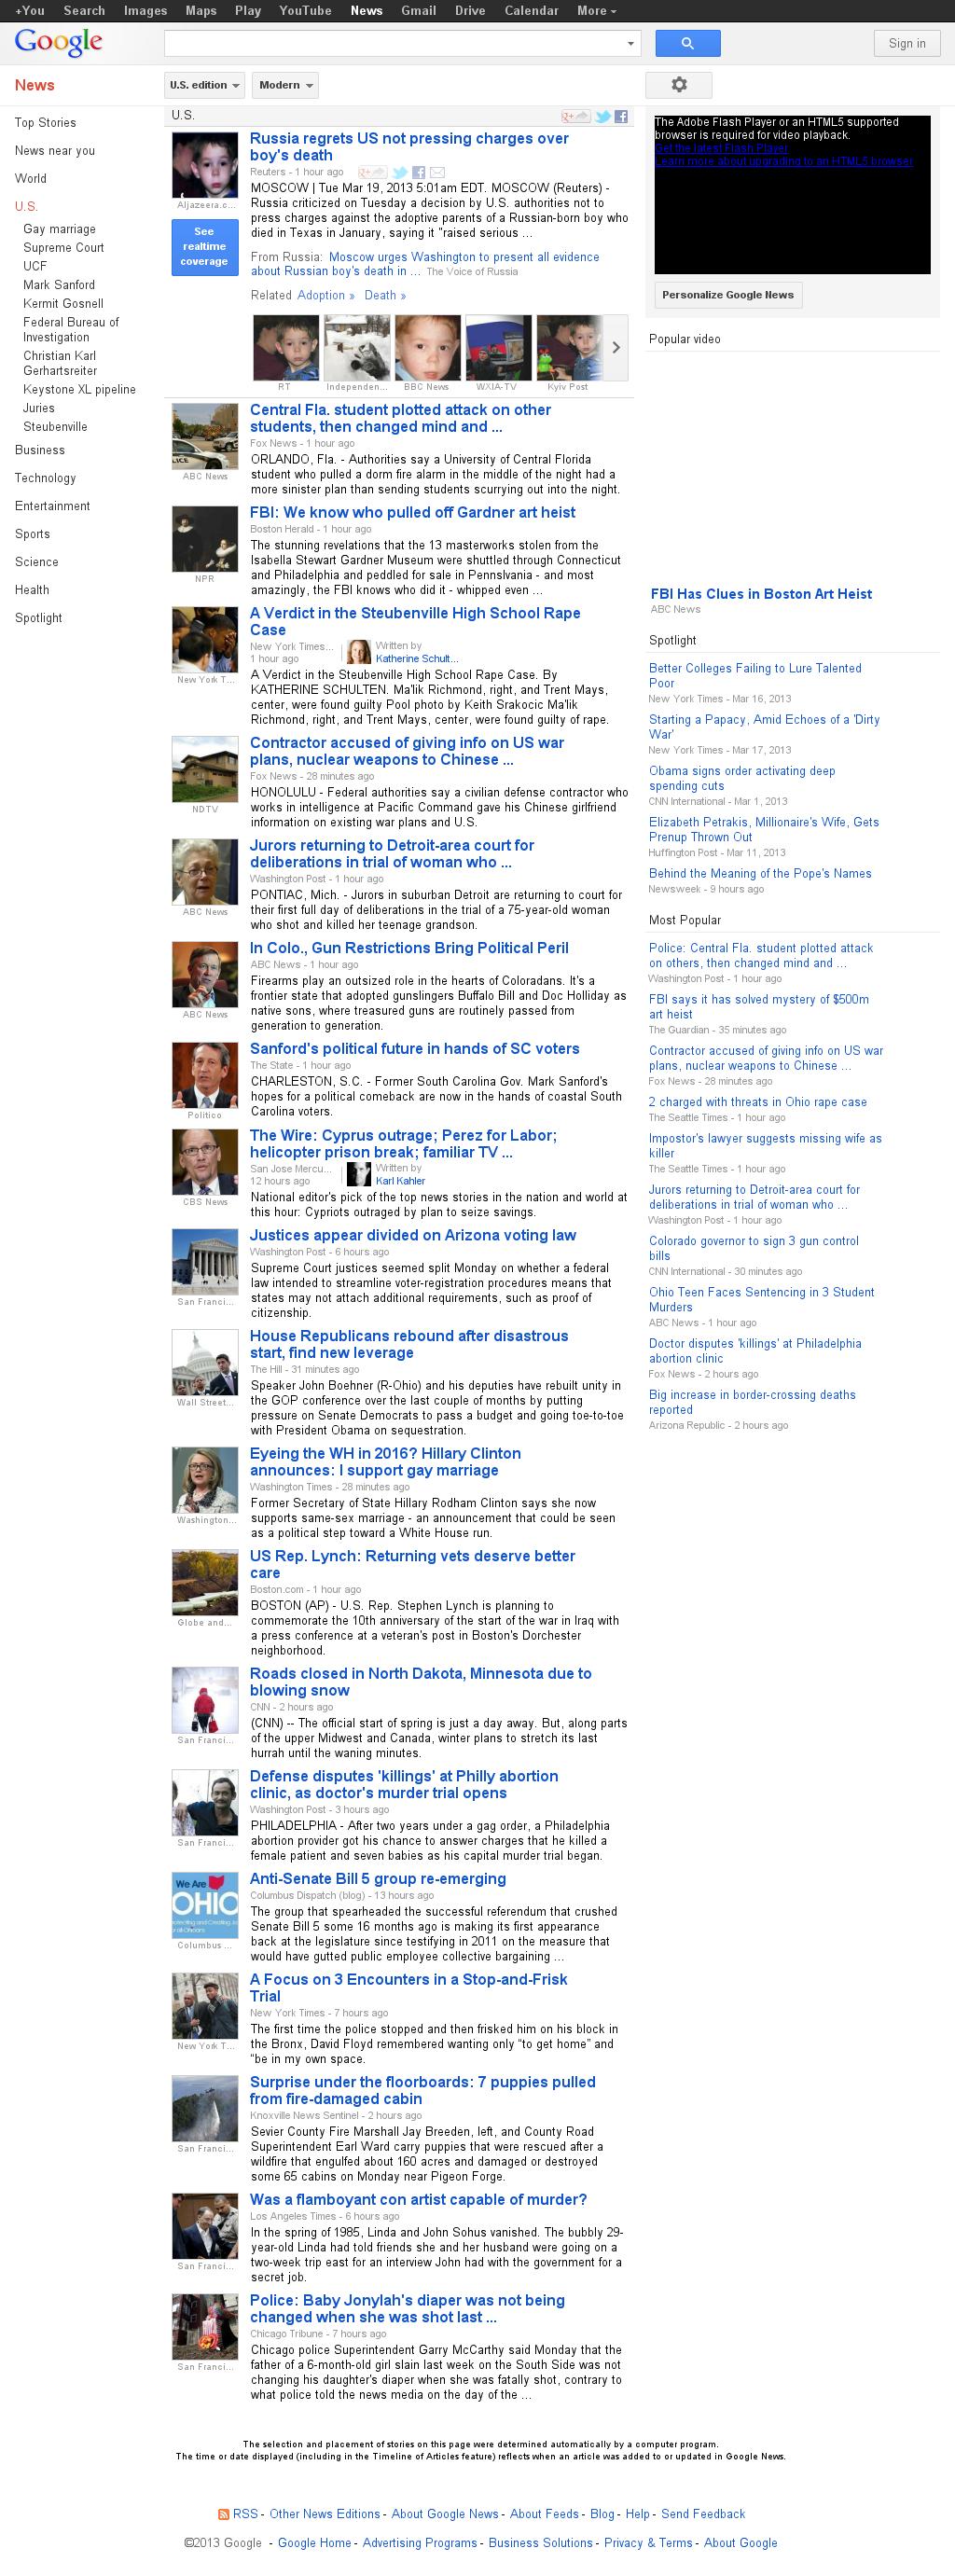 Google News: U.S. at Tuesday March 19, 2013, 10:10 a.m. UTC